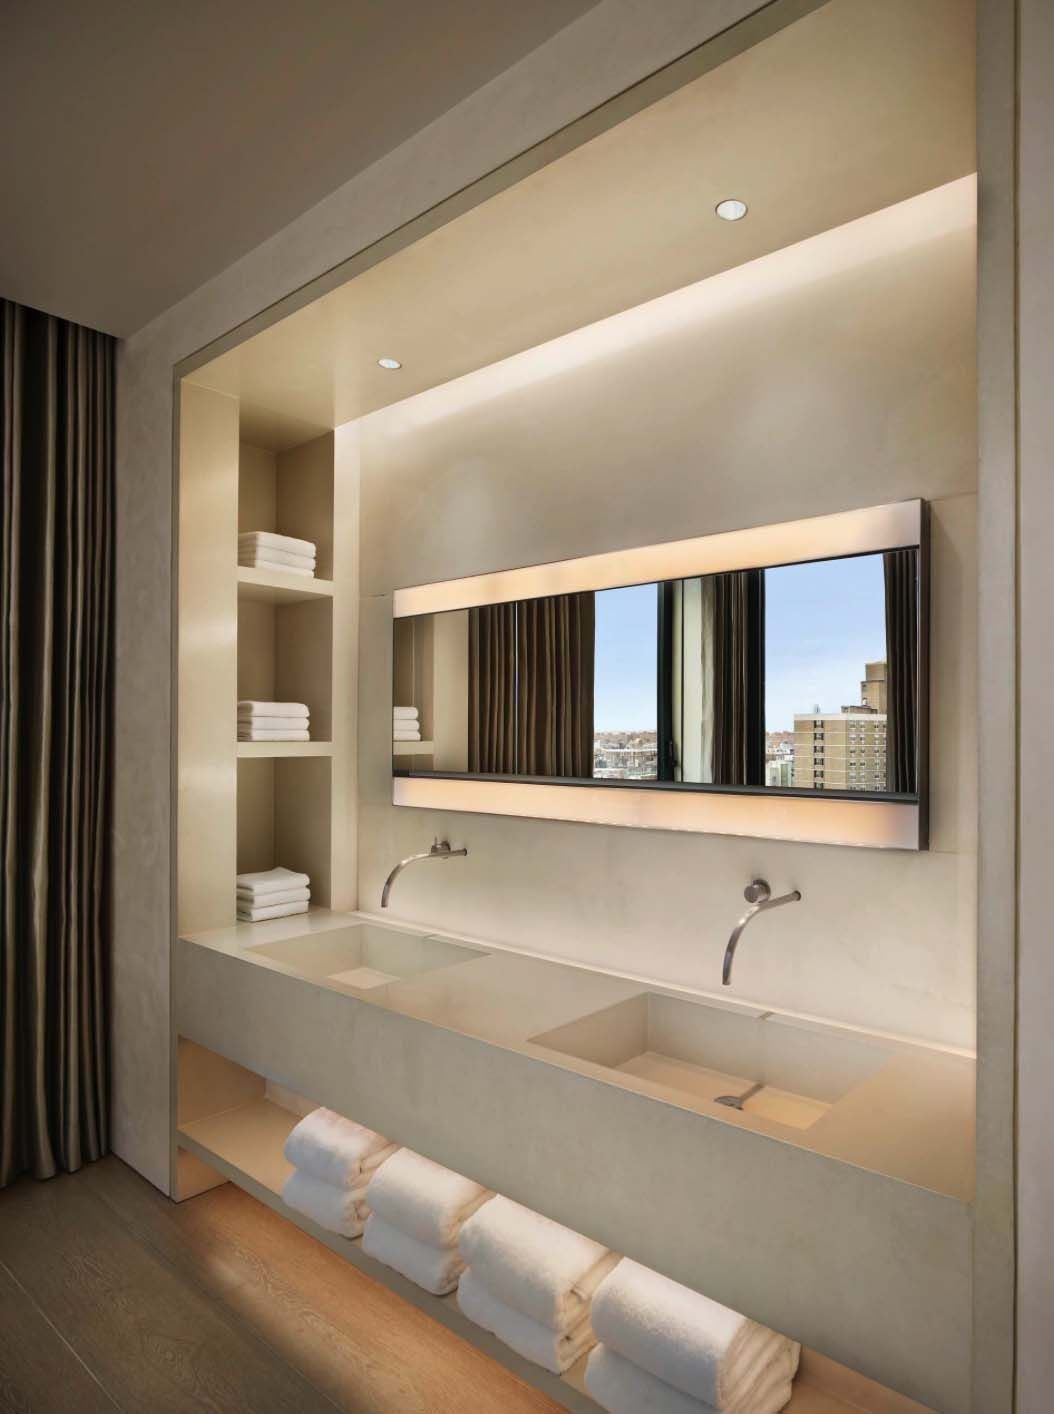 The Sunday 7 Feel All The Textures In 2020 Bathroom Styling Bathroom Interior Small Bathroom